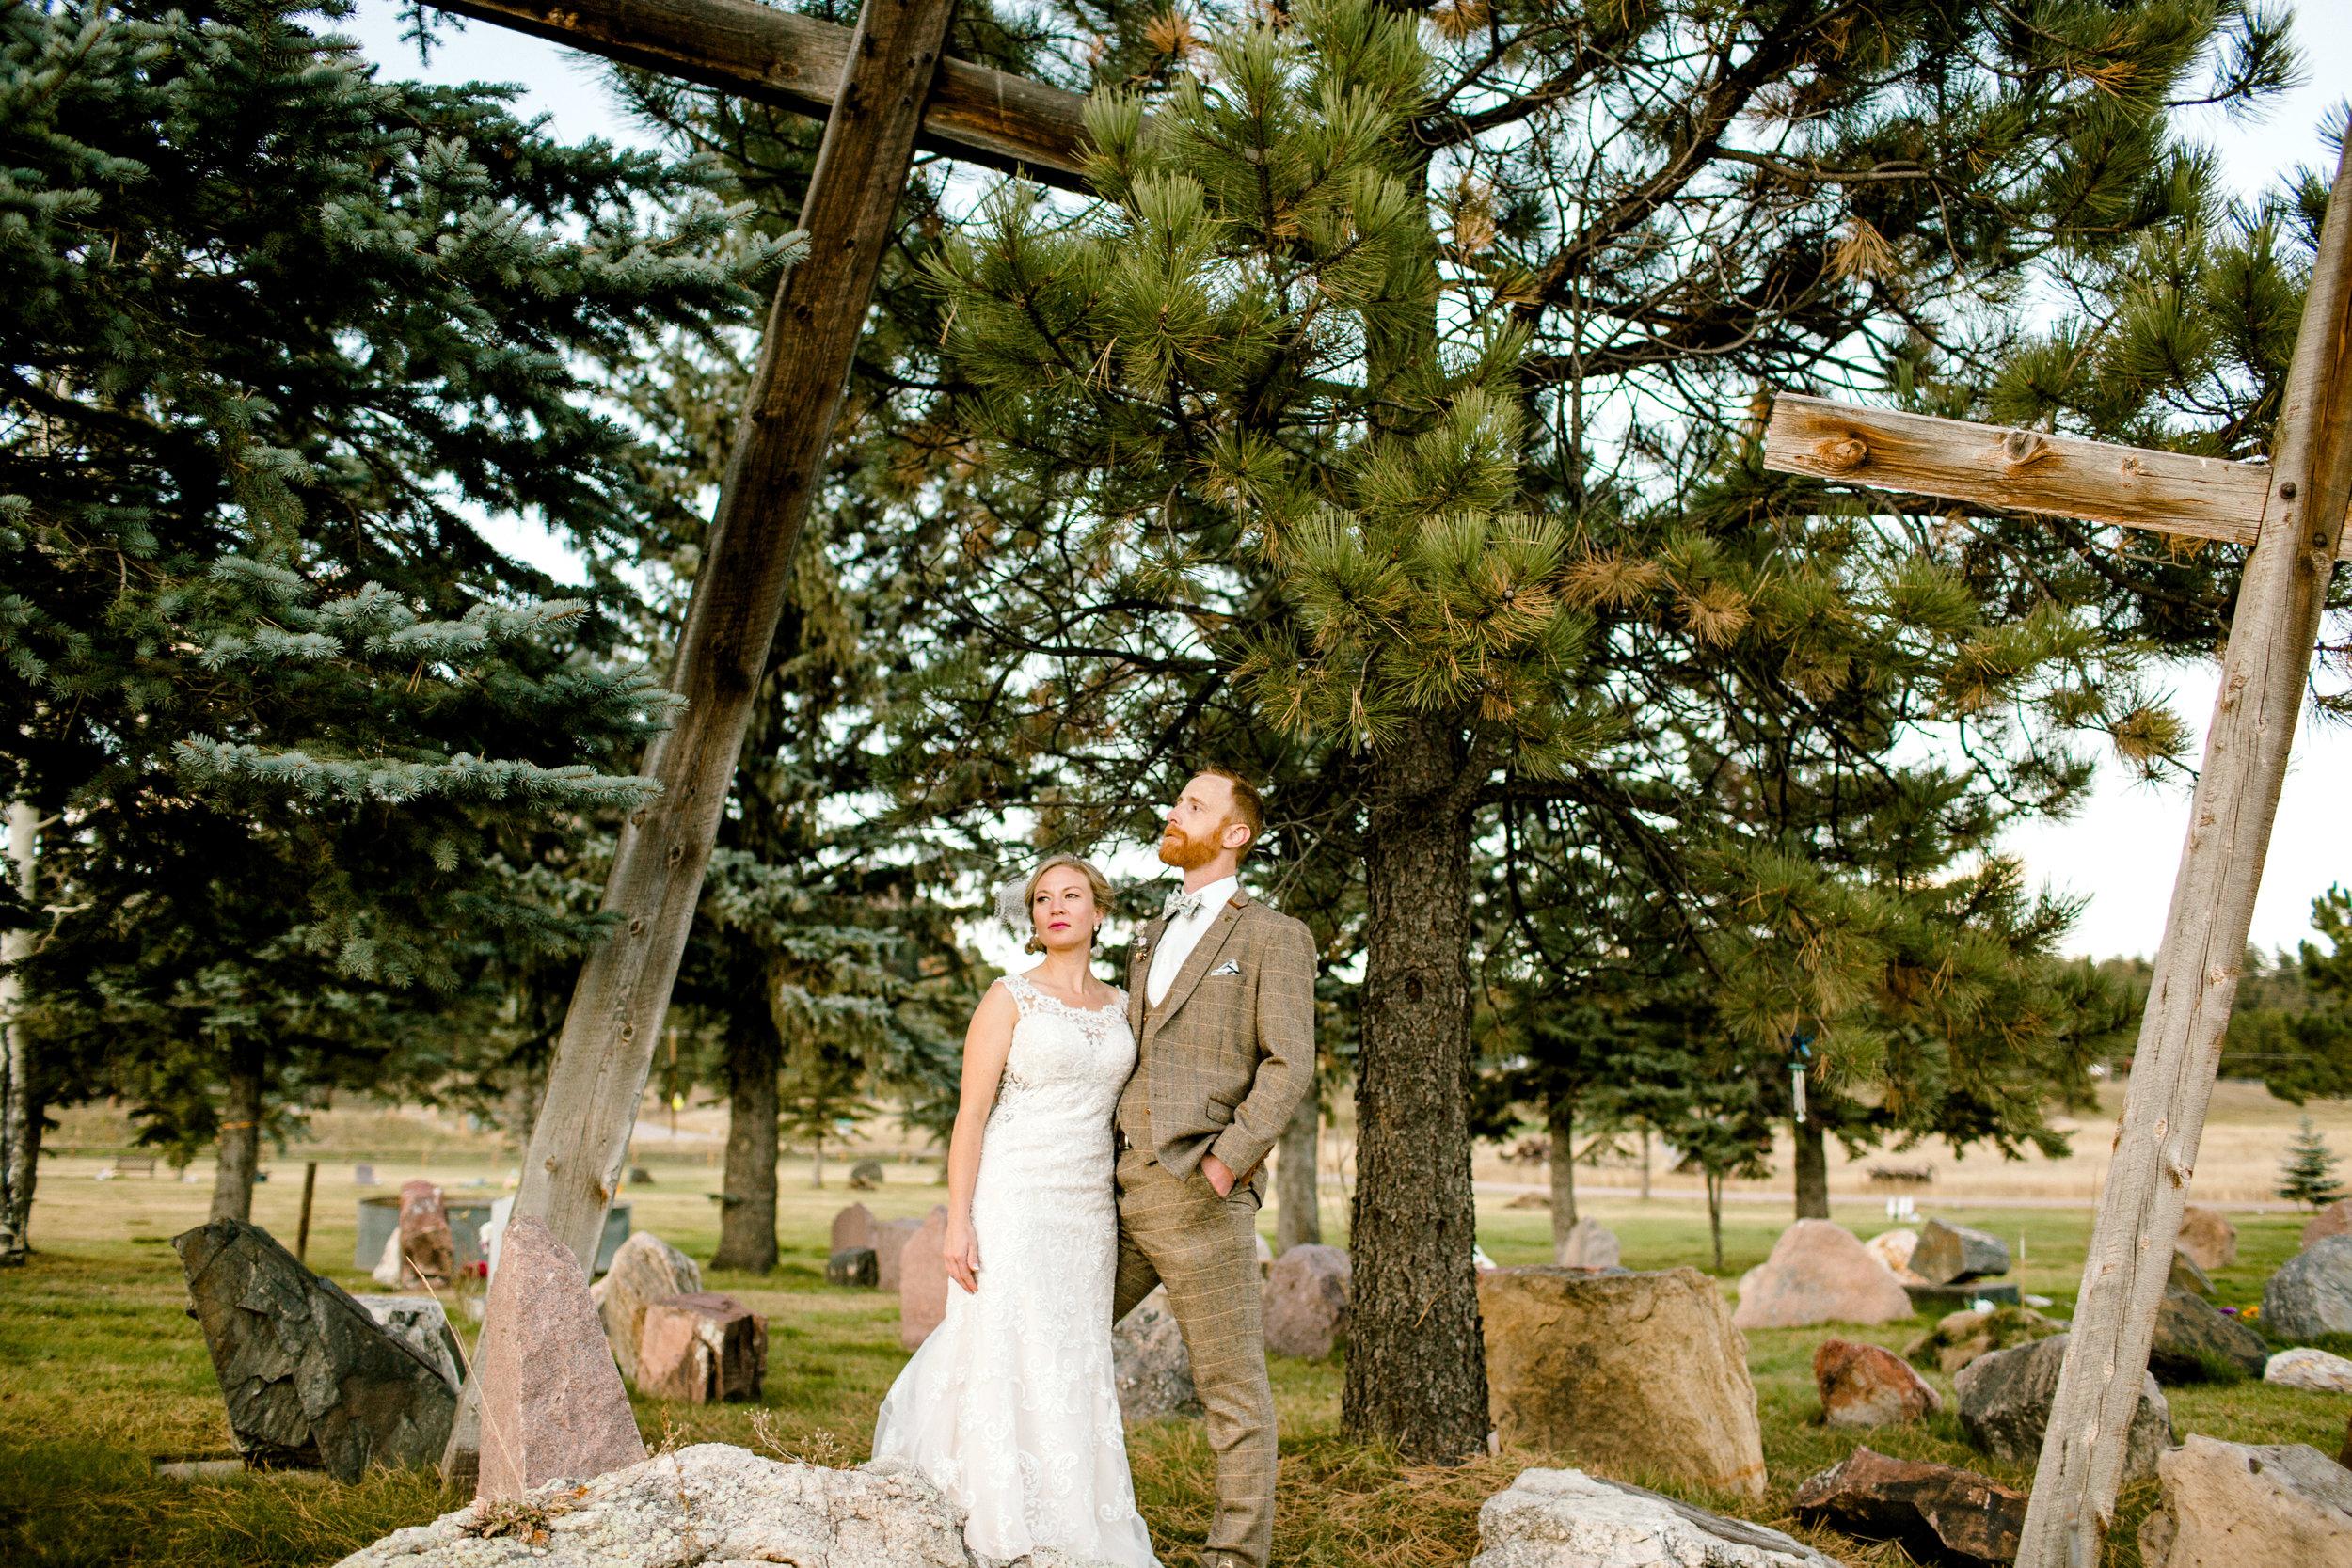 rockymountainwedding-613.jpg